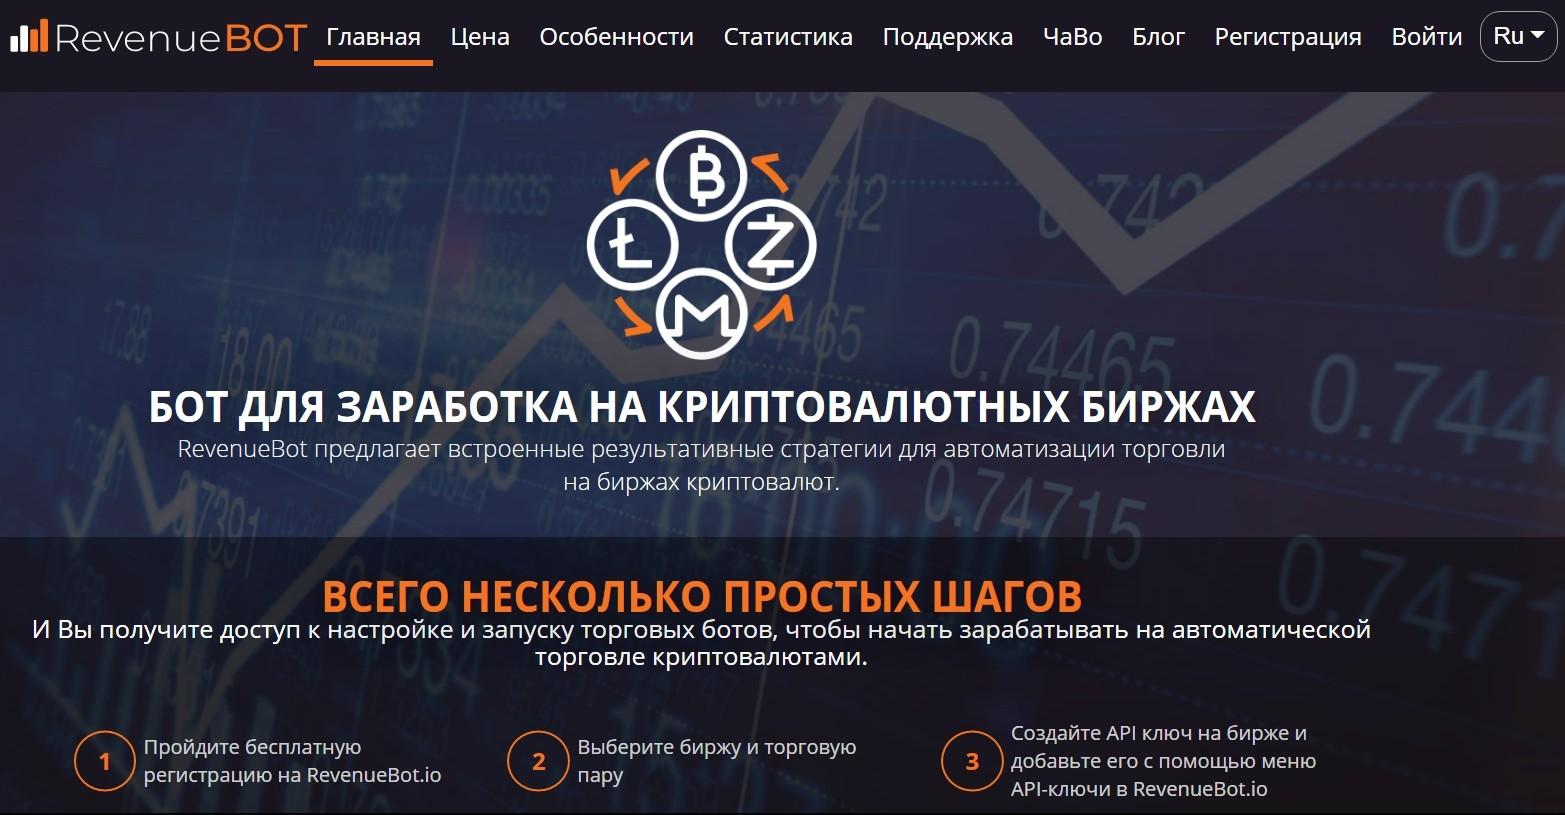 Сайт Revenue Bot